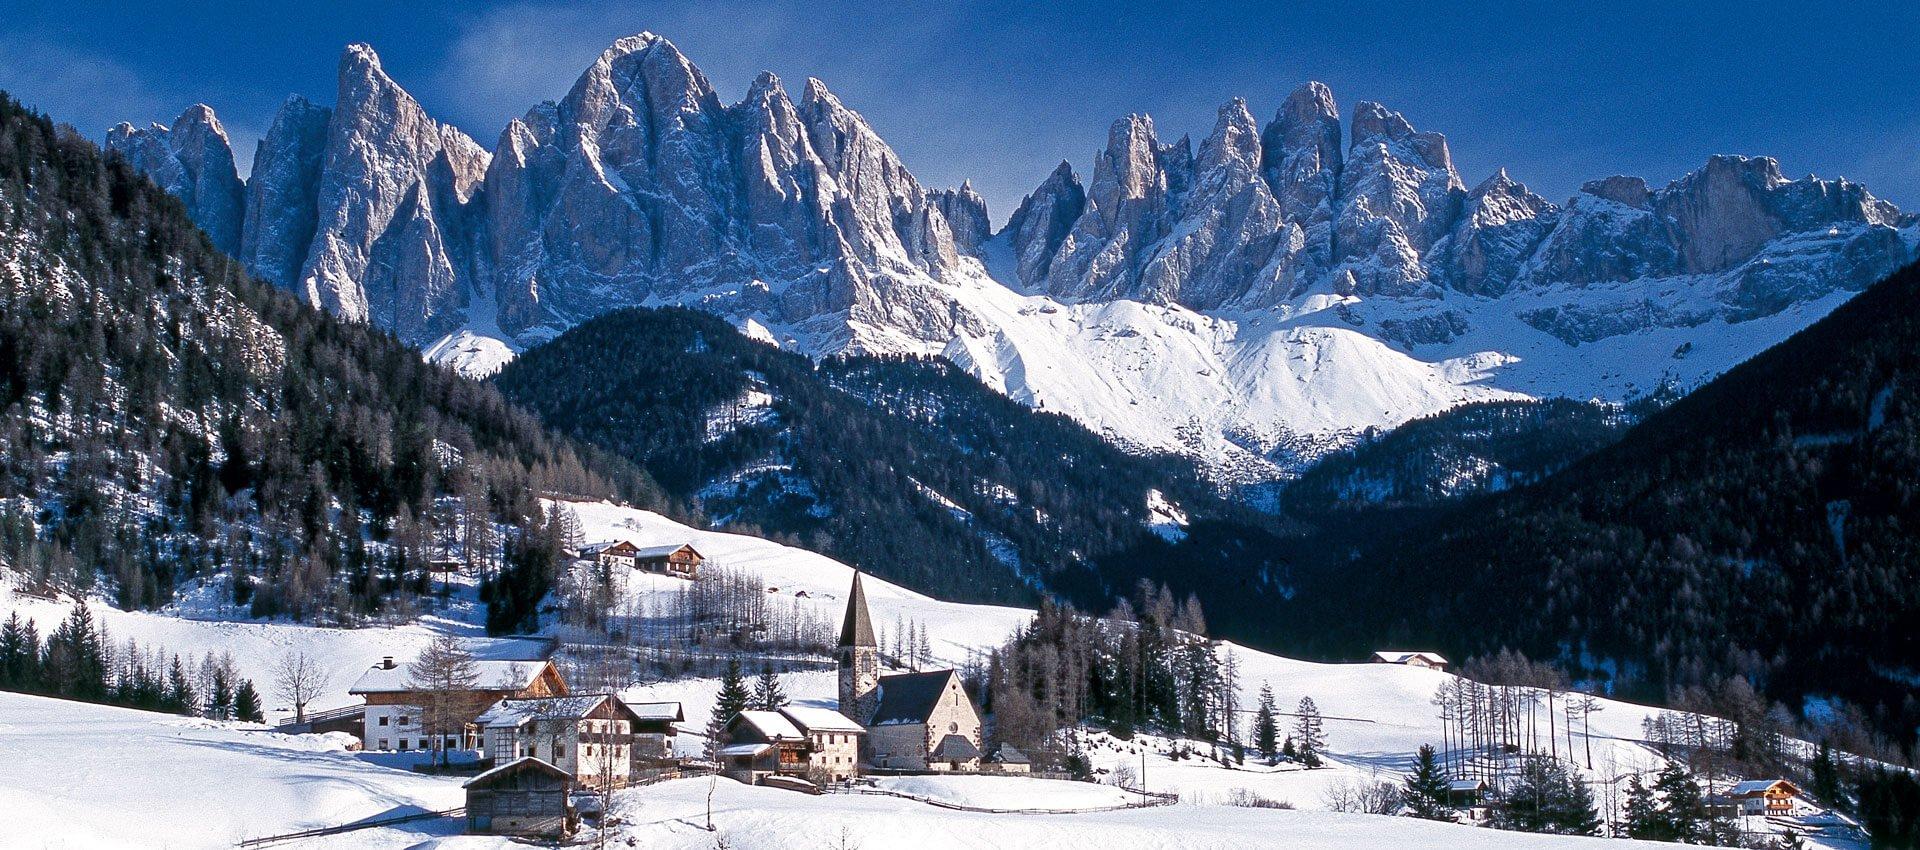 winterurlaub-villnoess